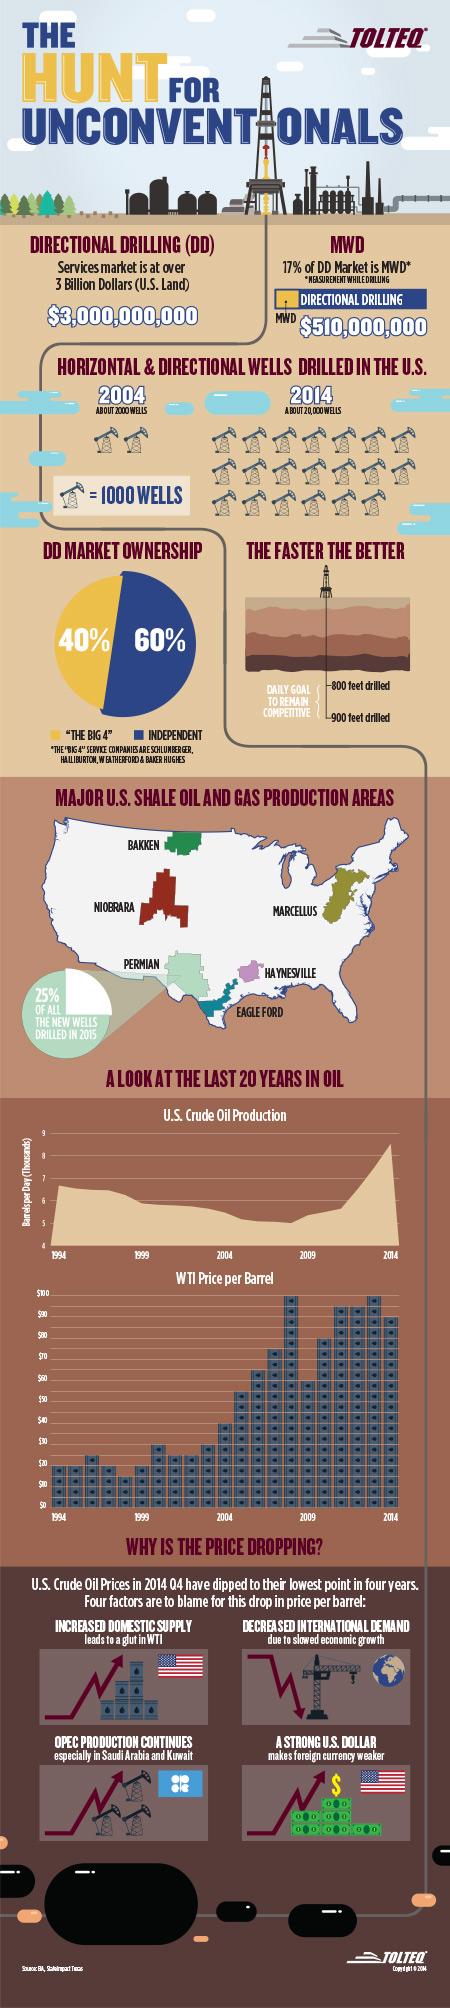 Most North America Shale Plays Still Profitable at $65/Barrel